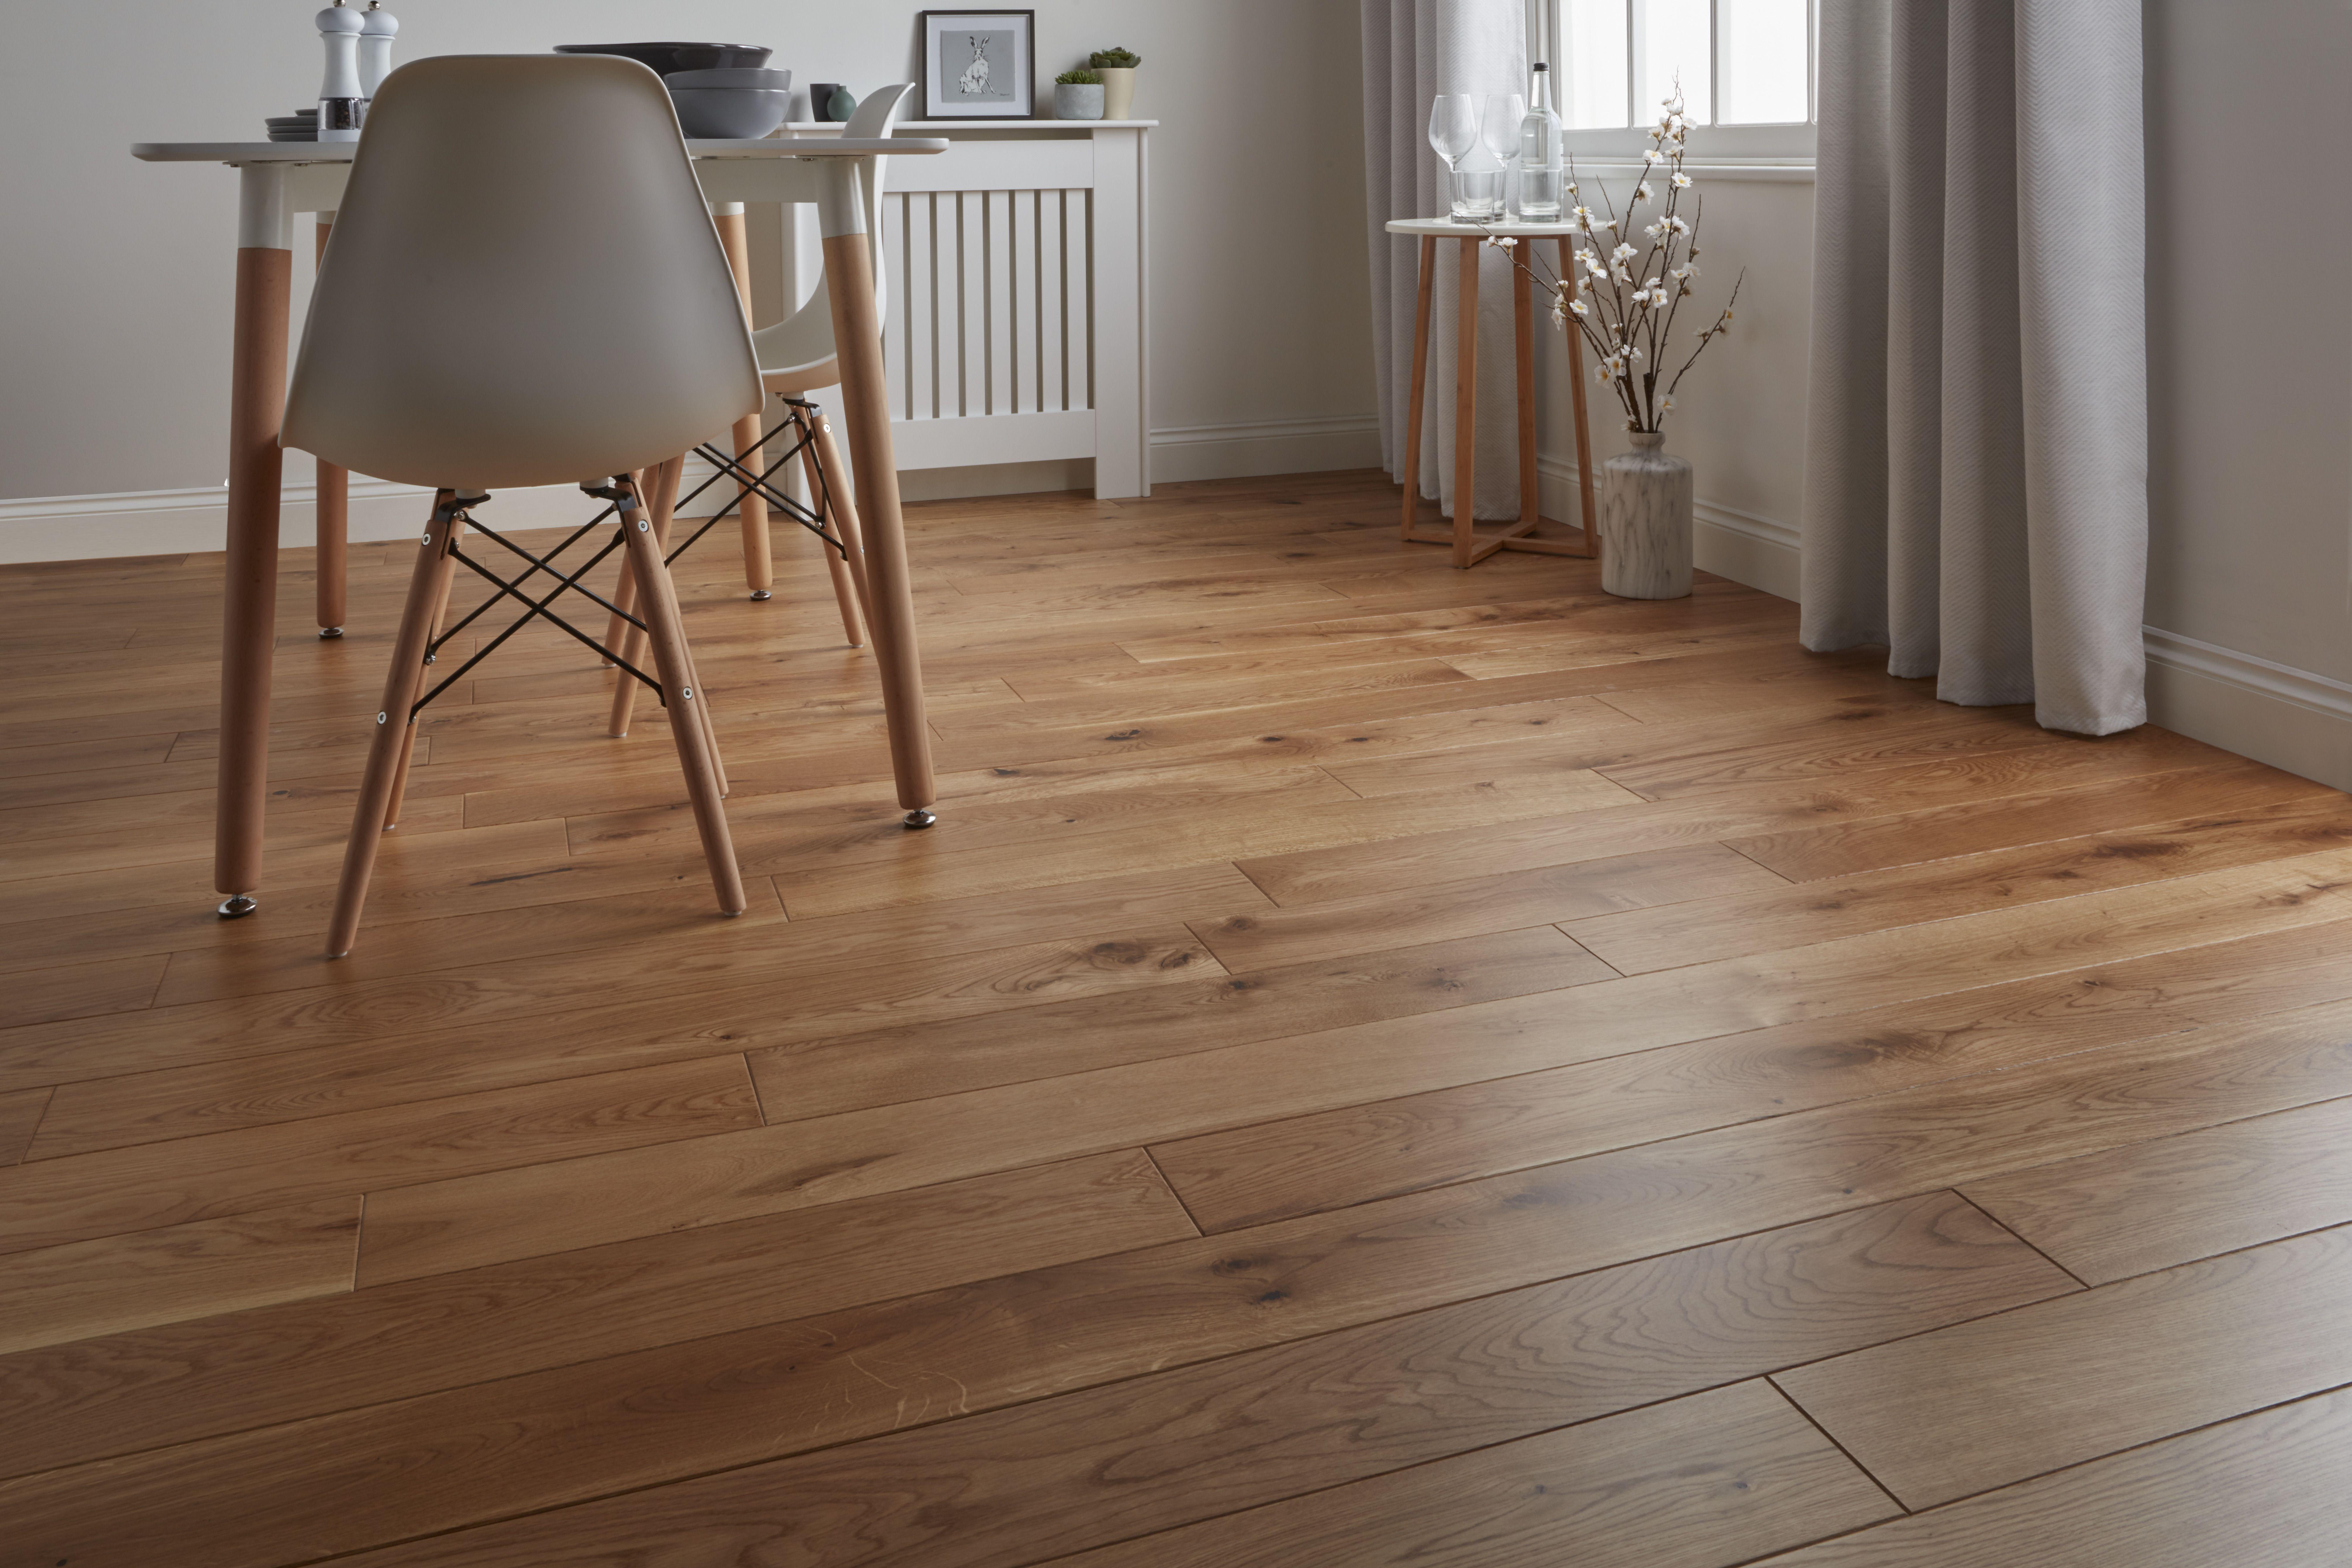 Deska Podlogowa Goodhome Lysekil Dab 1 56 M2 Hardwood Floors Lysekil Hardwood